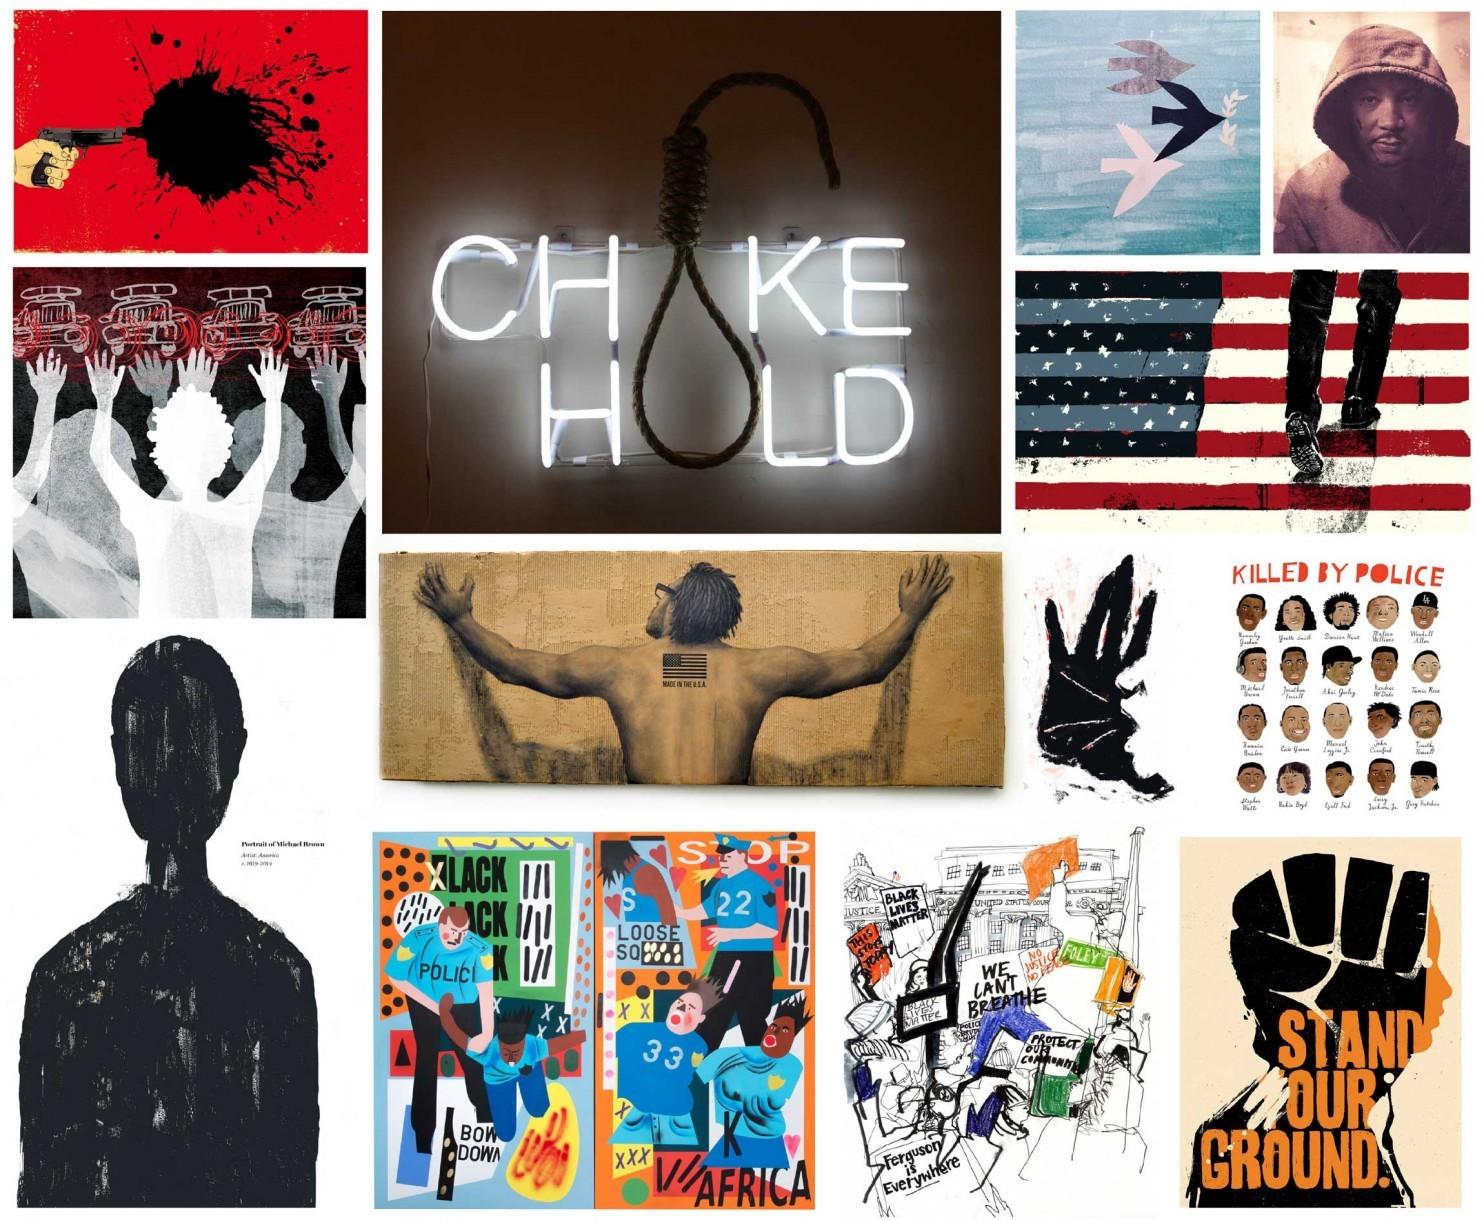 black lives matter art on instagram - washington post